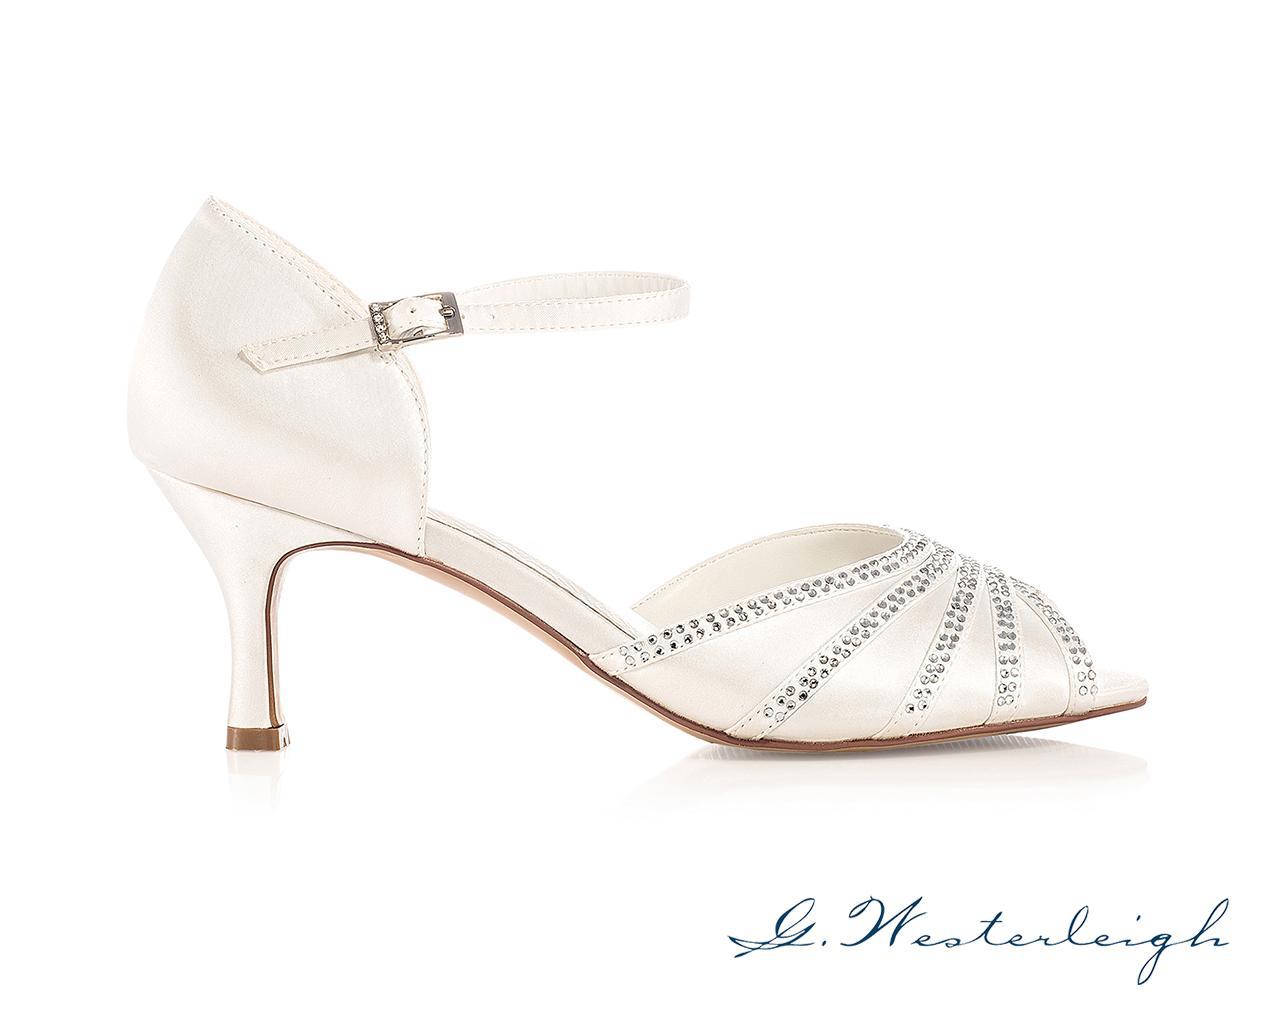 Svadobné topánky Jessica - Obrázok č. 2